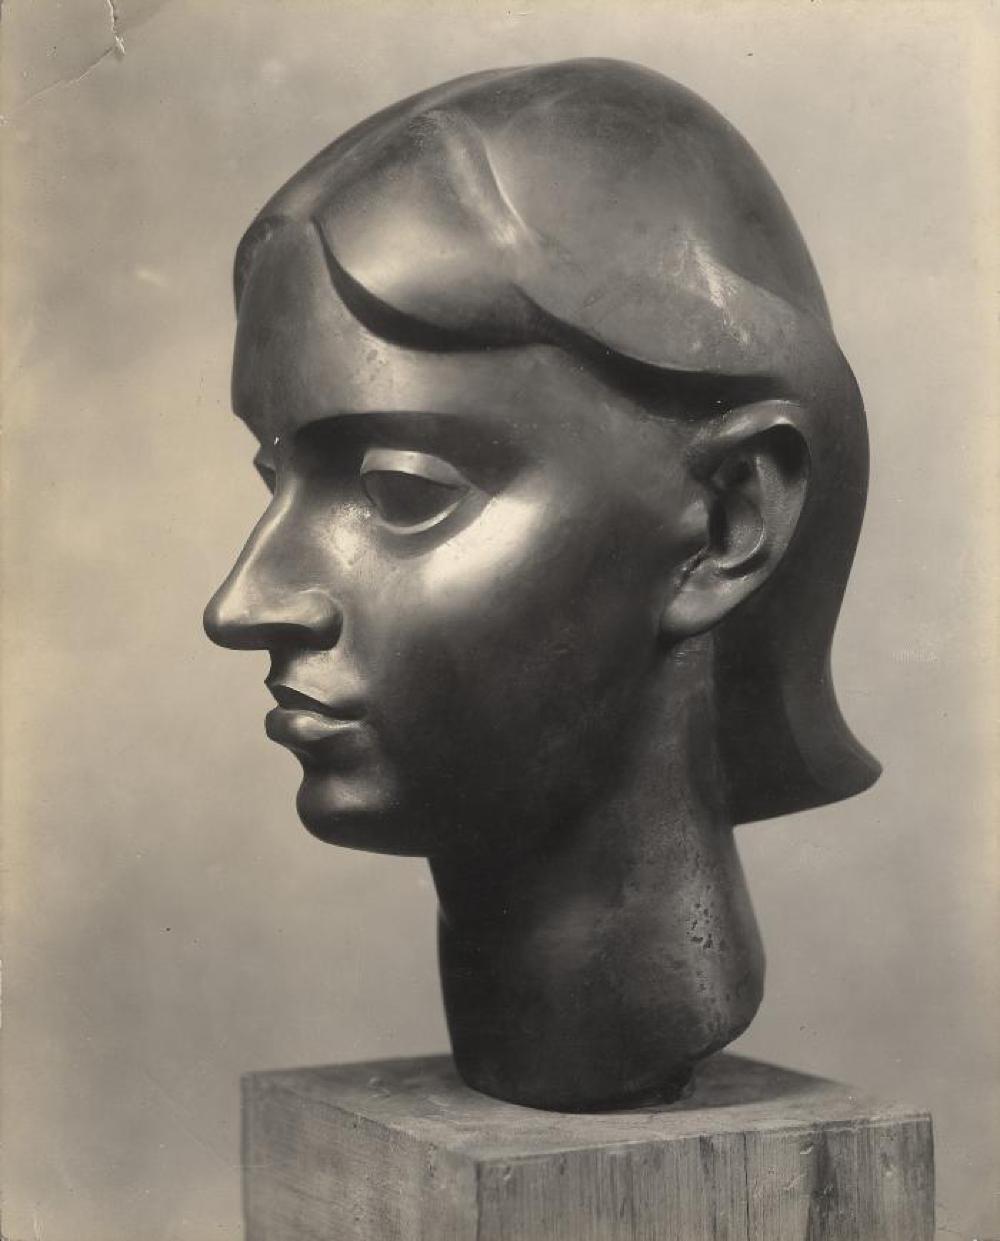 Marion Greenwood, image 2